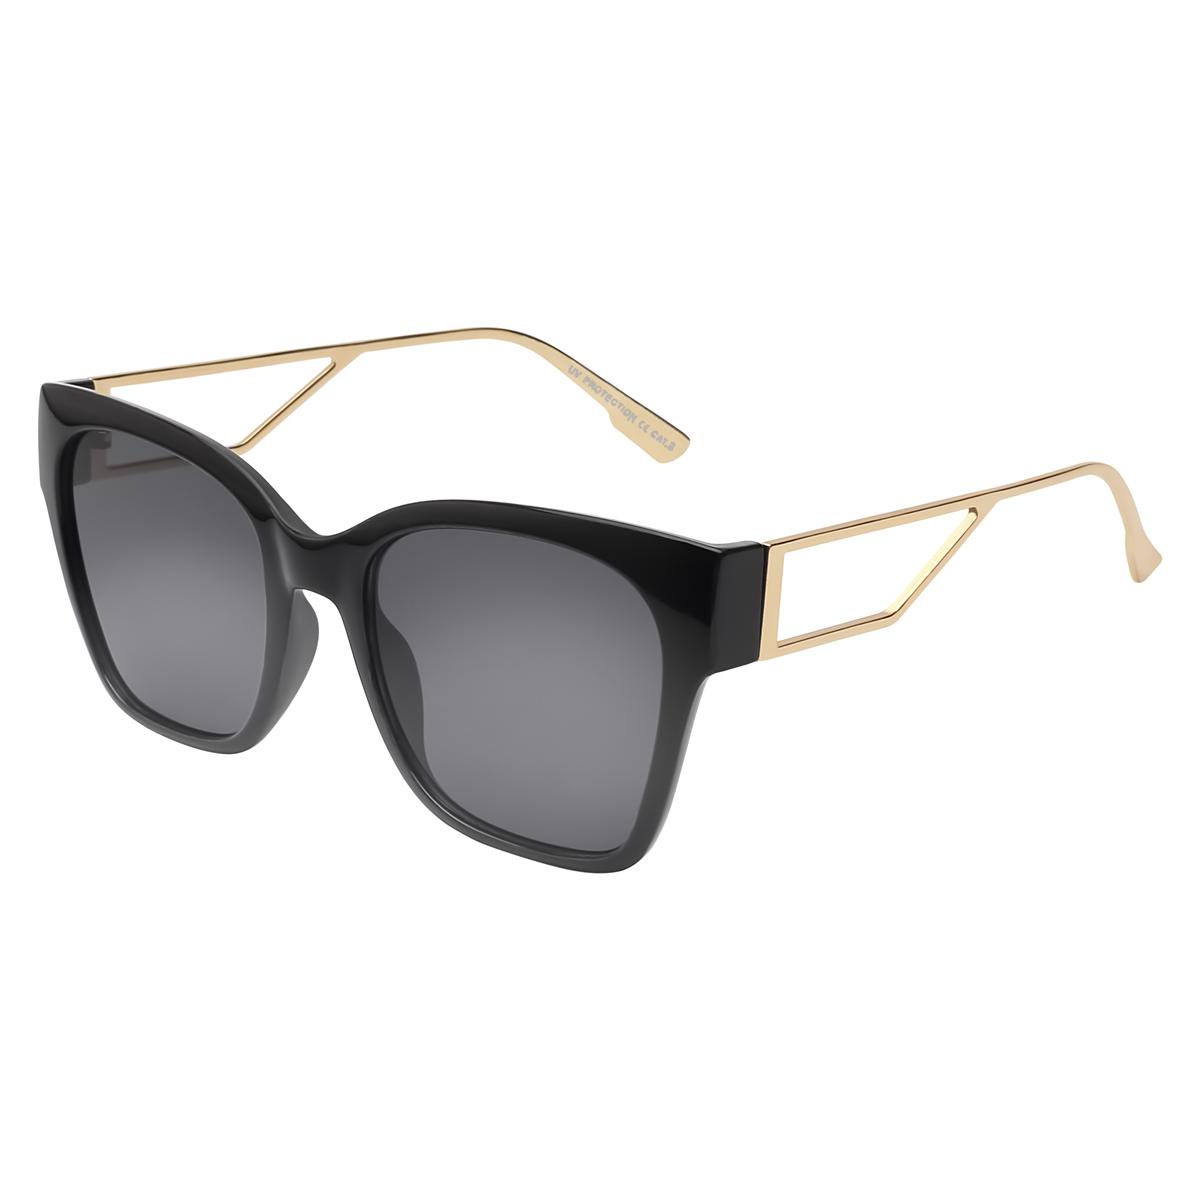 Sunglasses Frame It